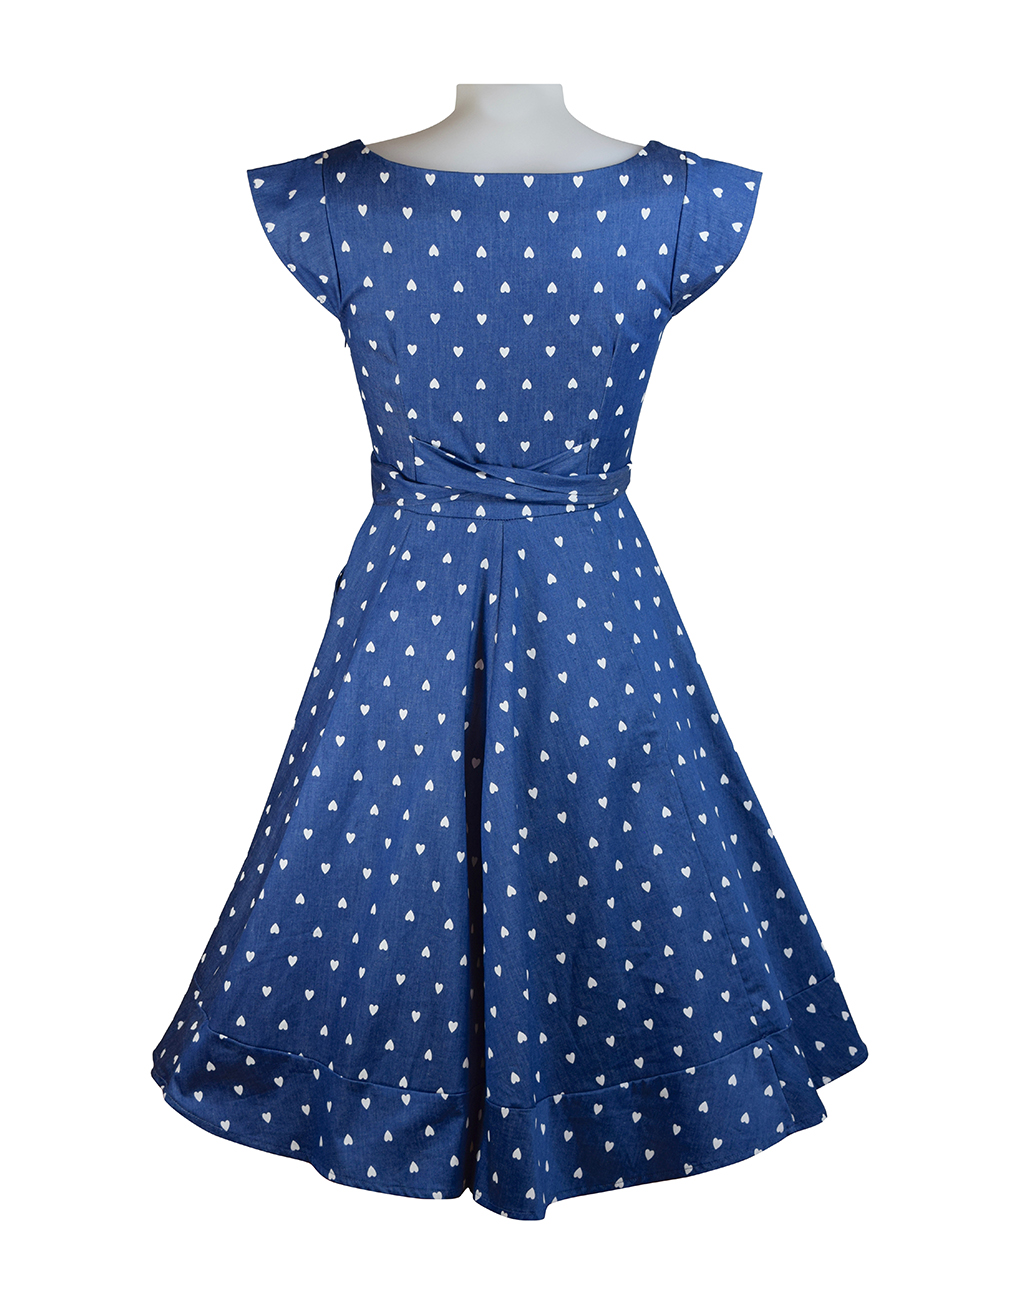 Banned-Apparel-Sweet-Treat-Dress 5093